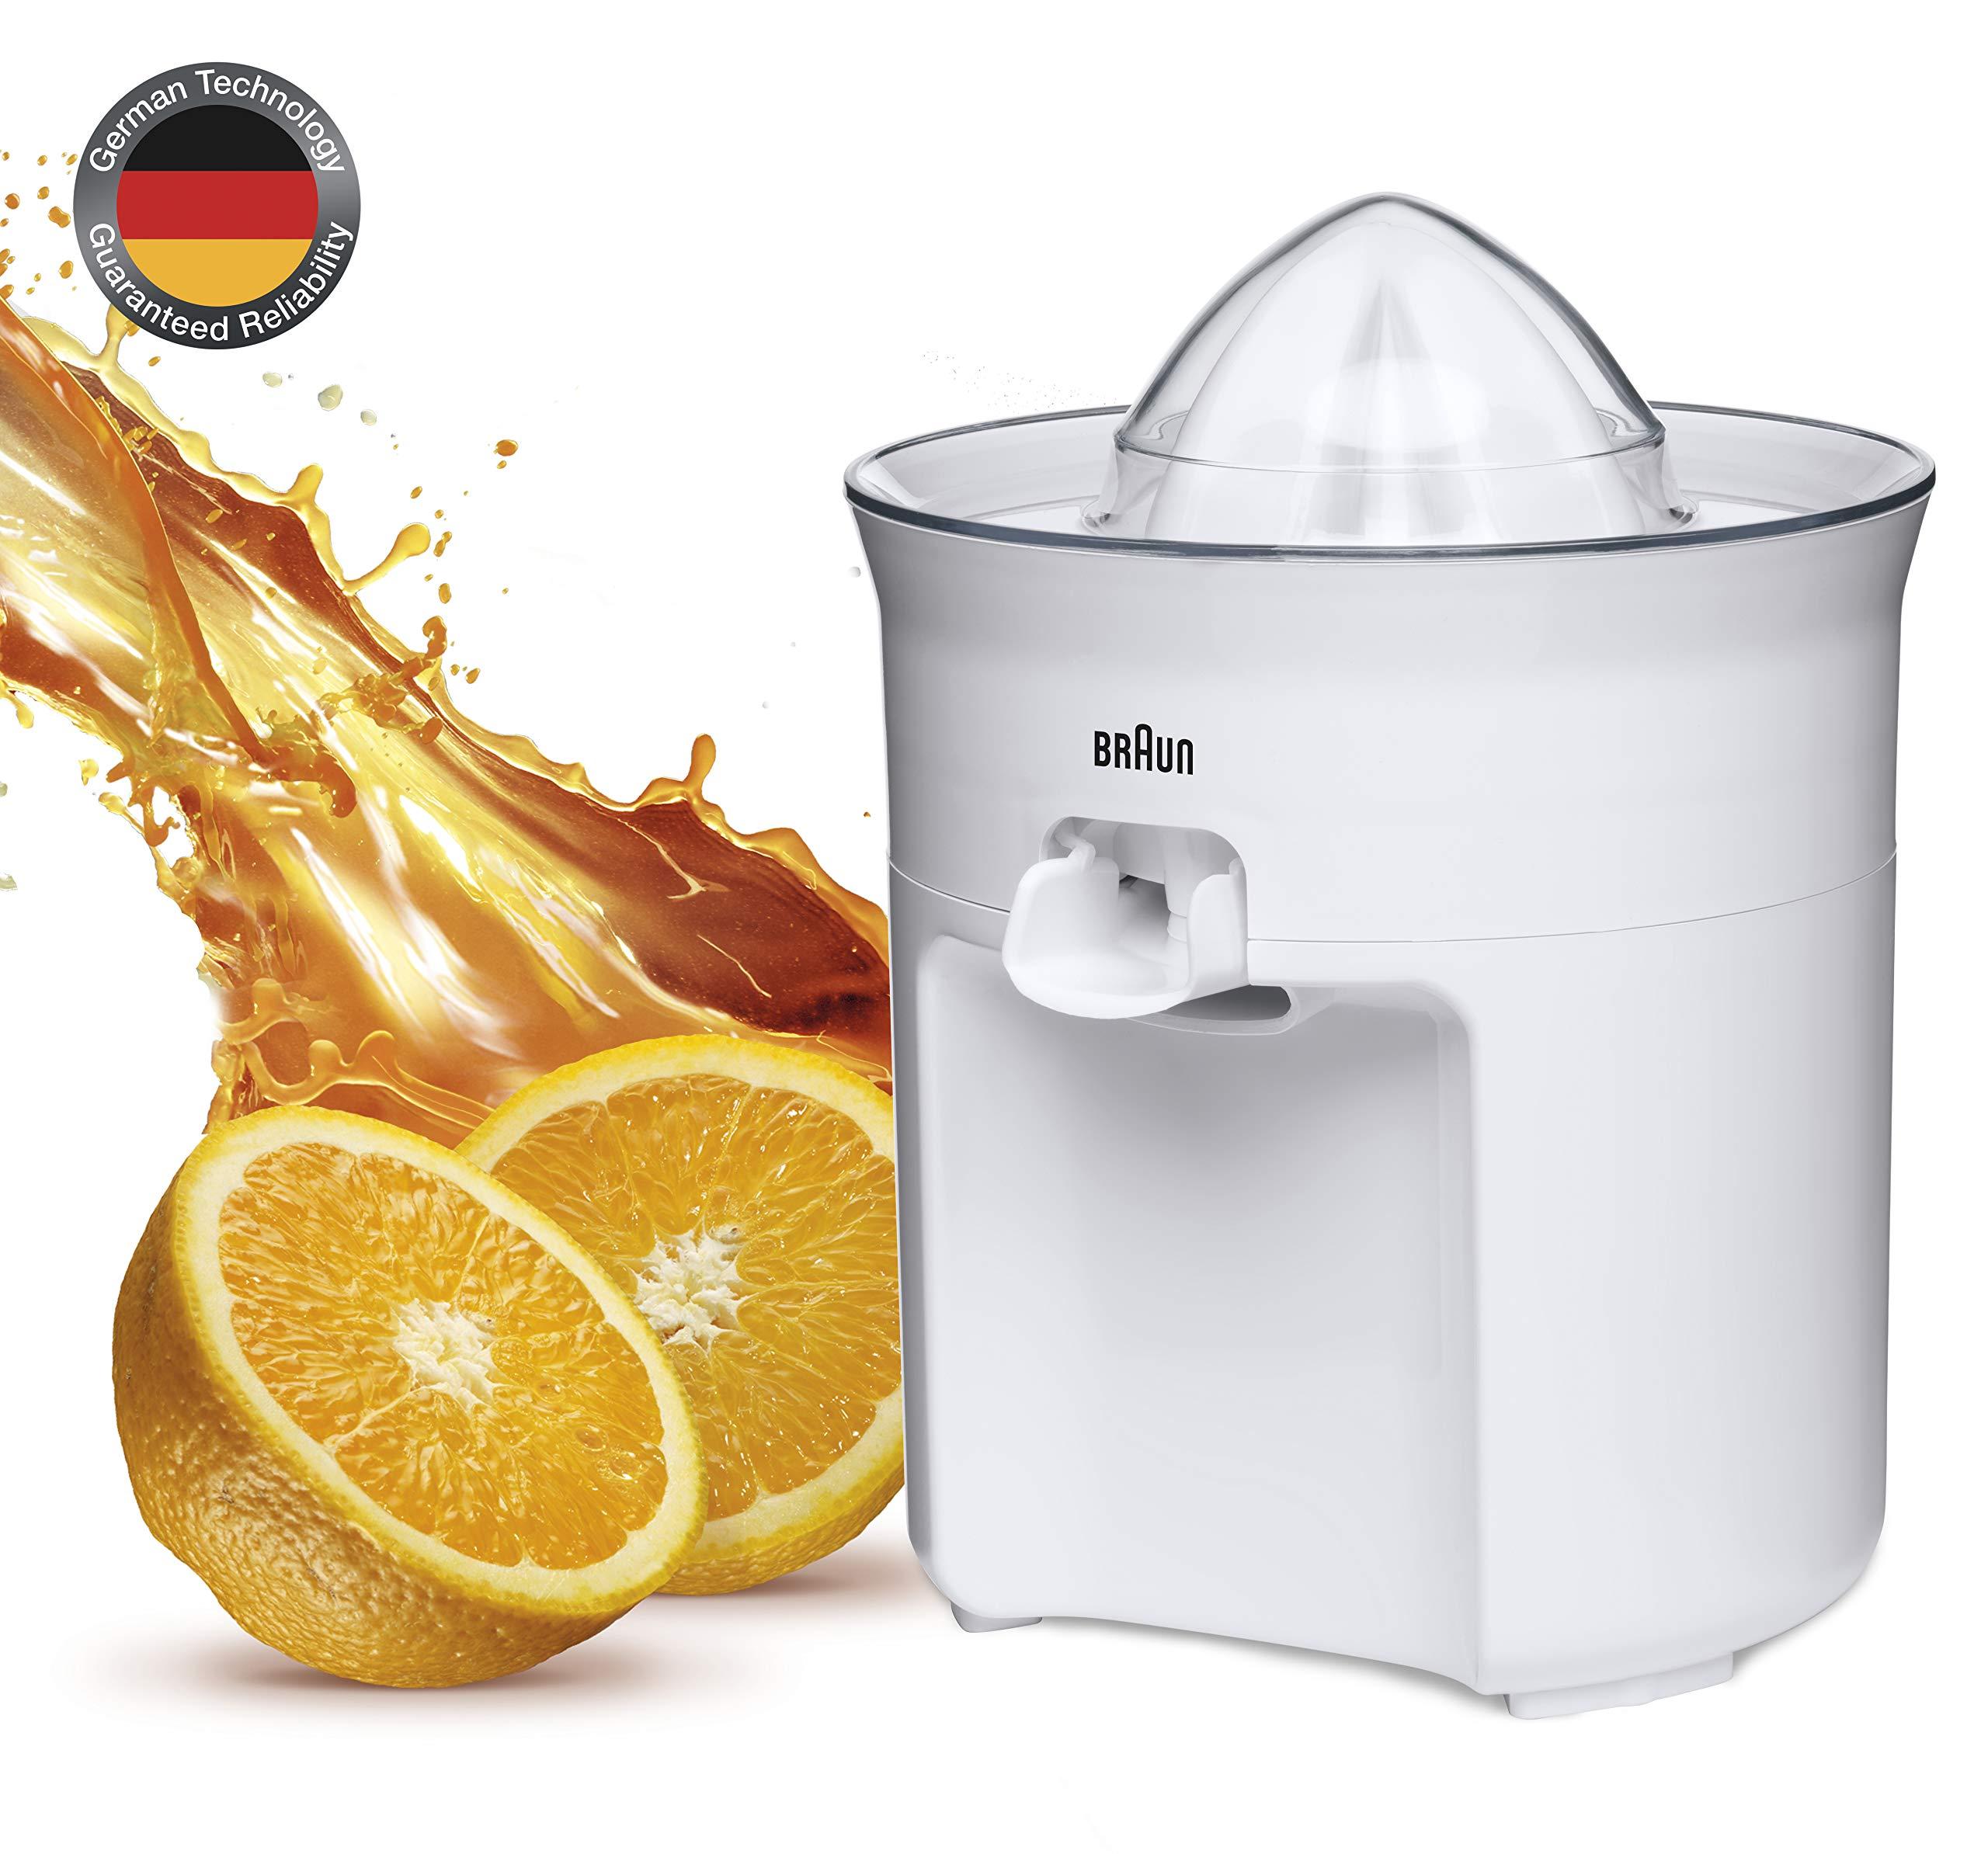 Braun CJ3050 - Exprimidor de Zumo de Naranjas (60 W, surtidor antigoteo, incluye